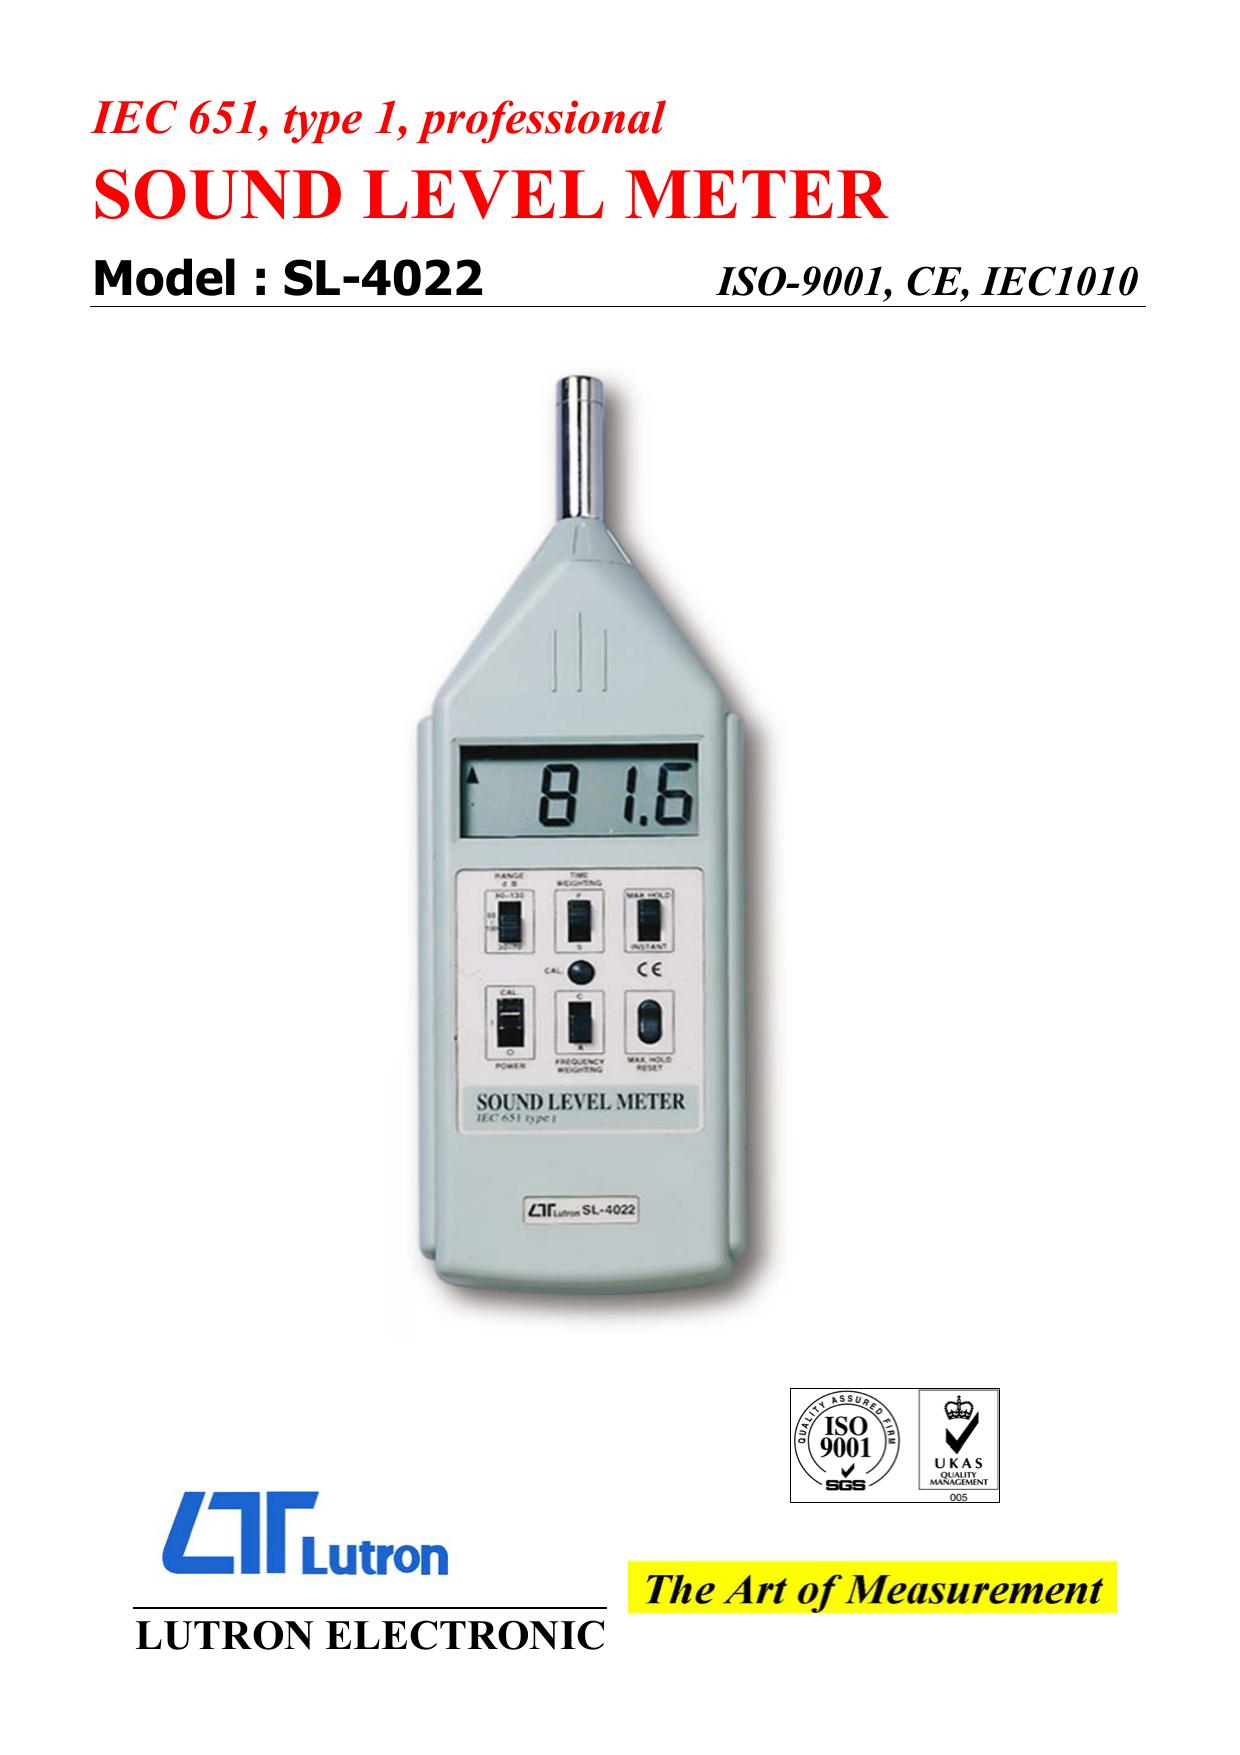 sound level meter - Svenska Termoinstrument | manualzz com